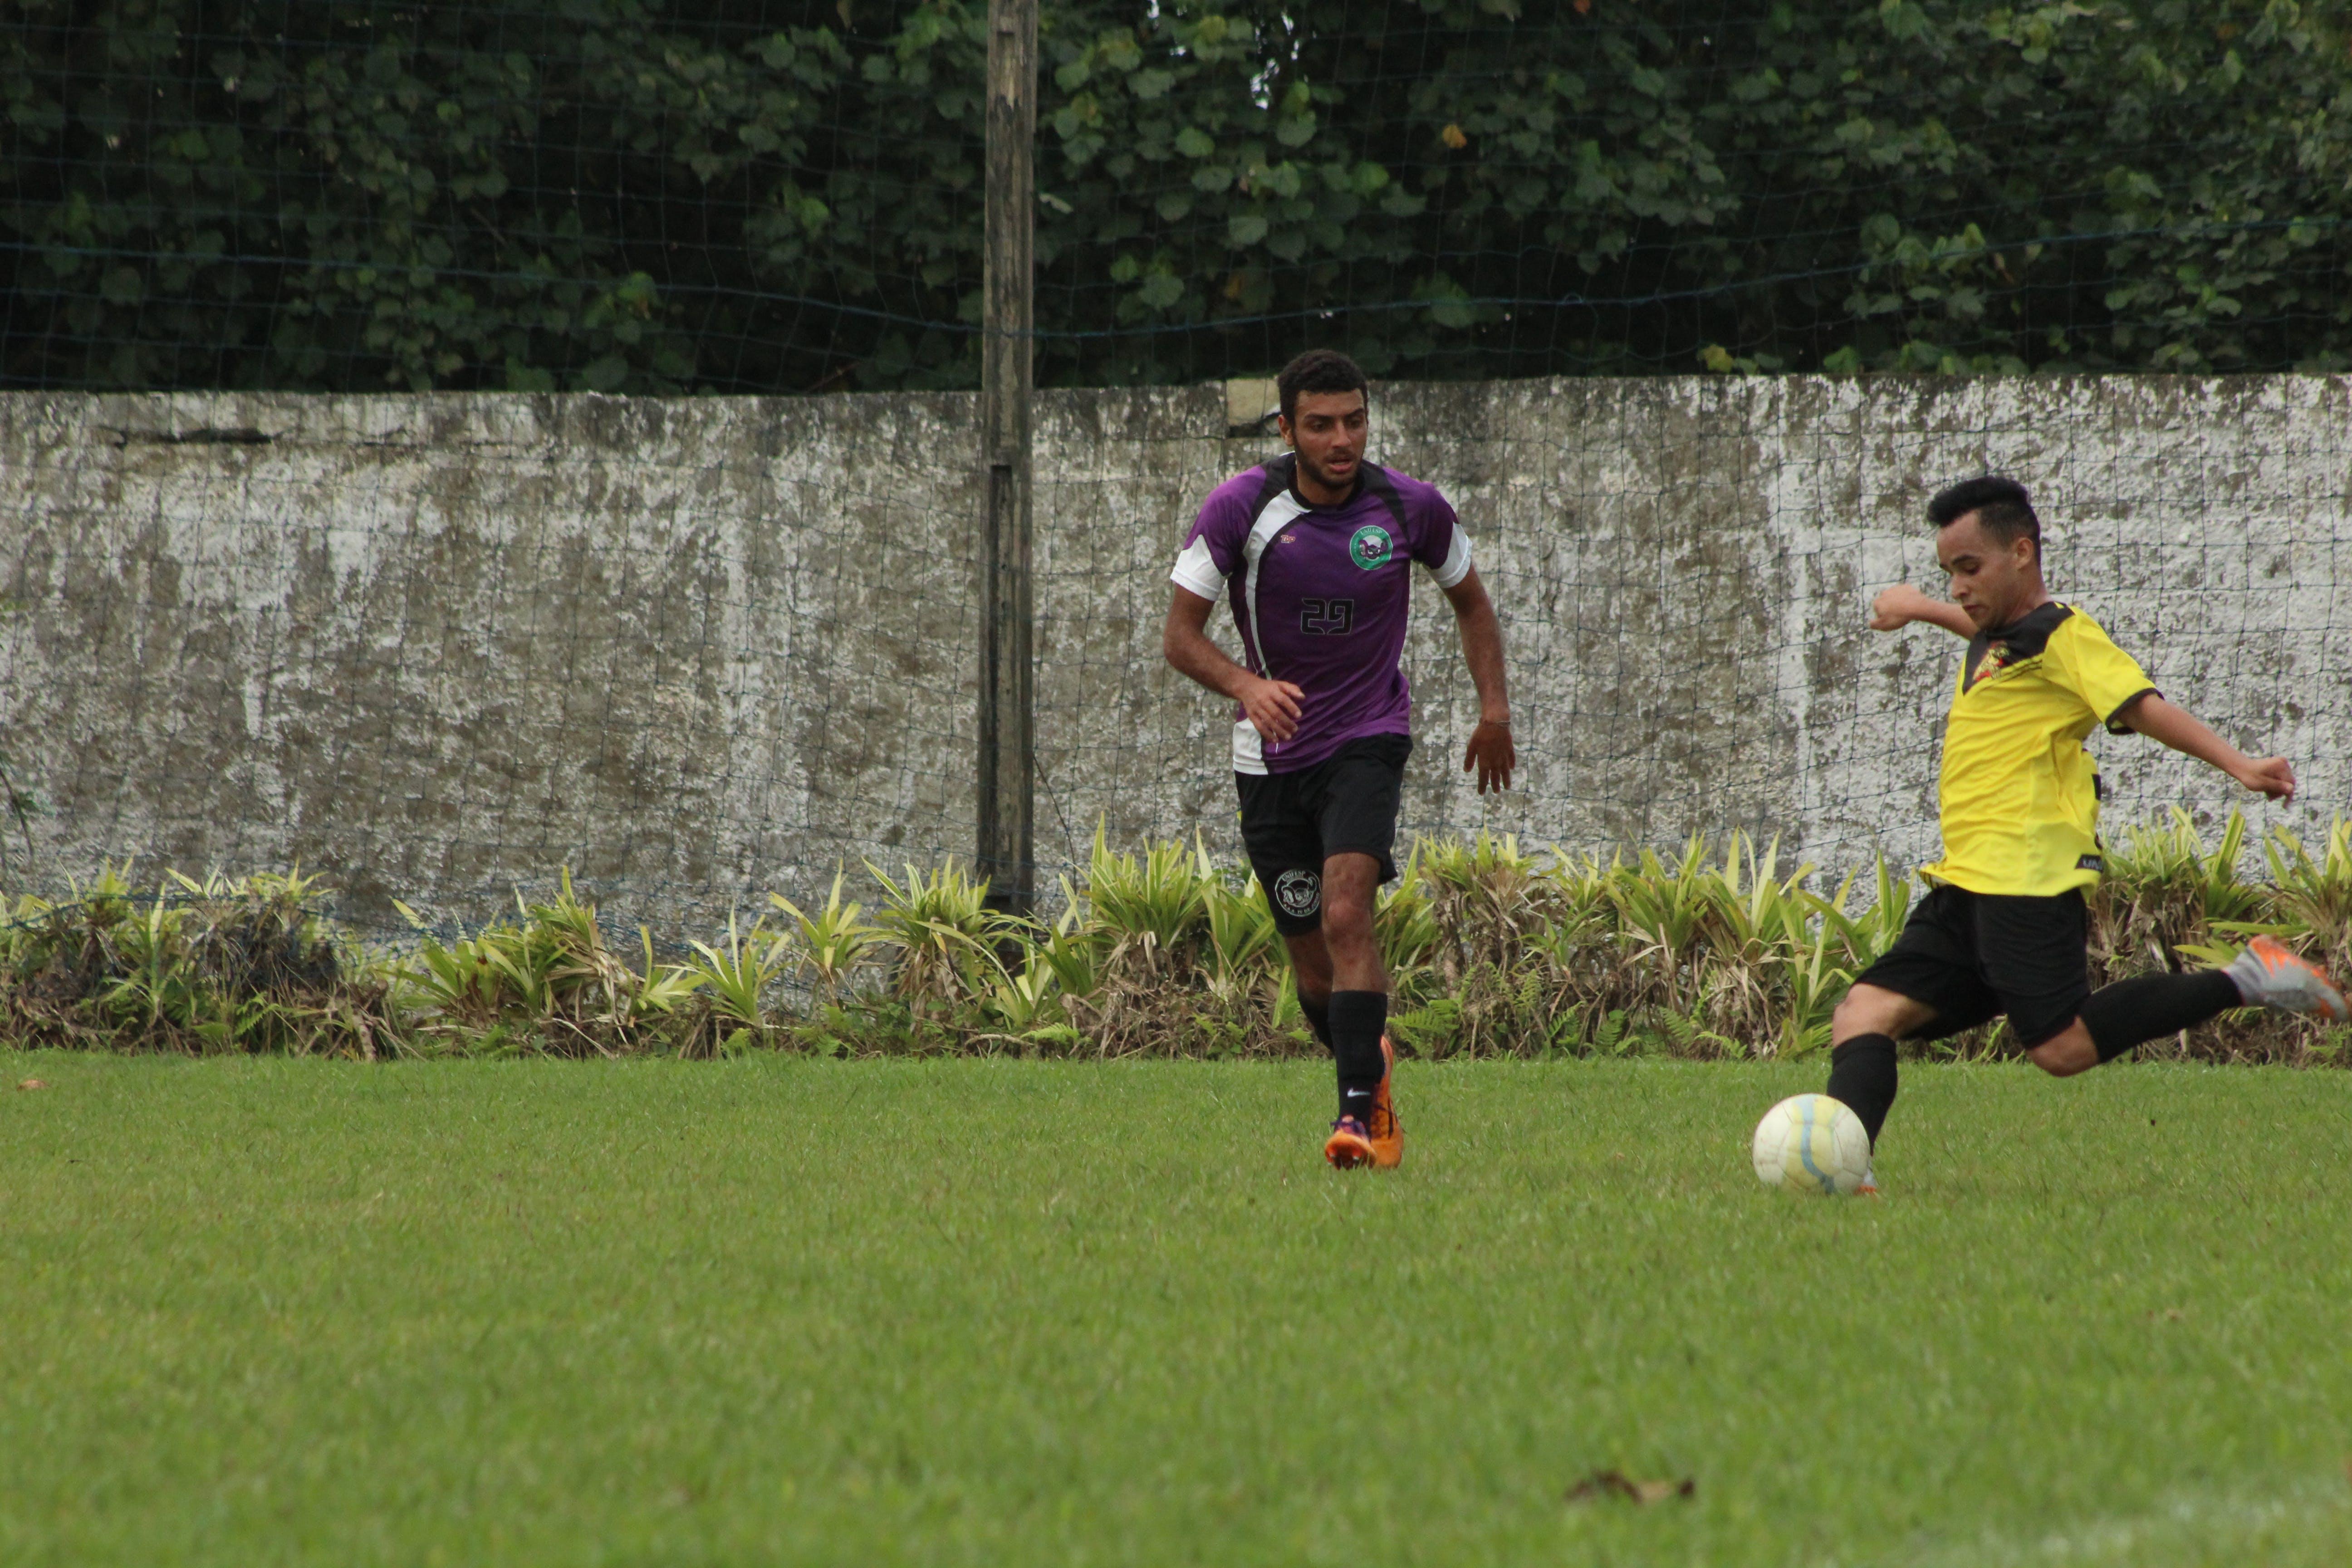 Free stock photo of purple, yellow, grass, sport